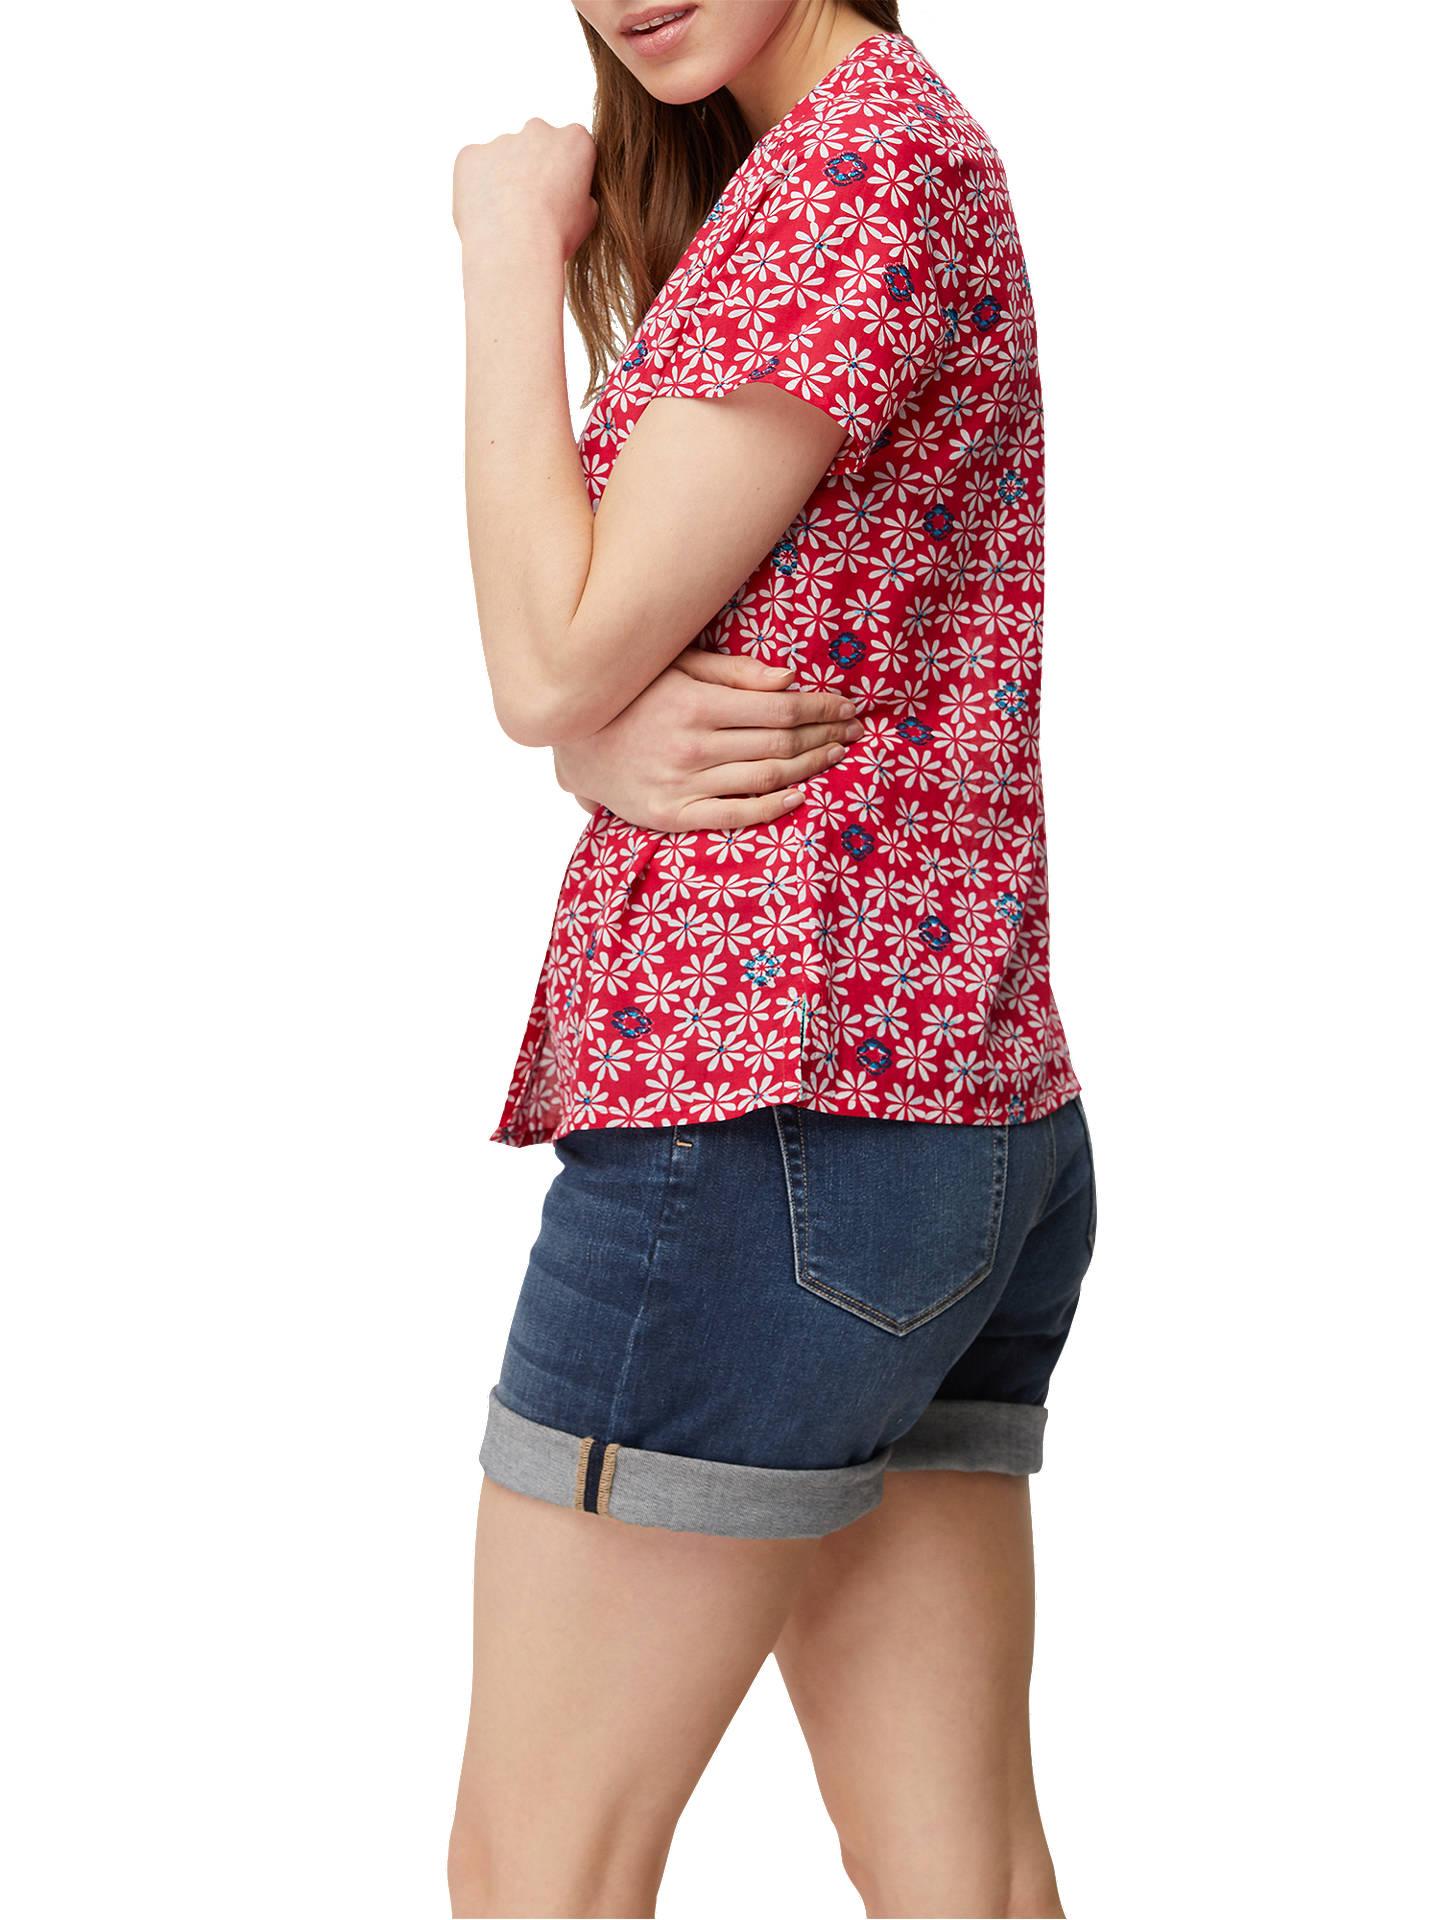 ... Lengan Pendek Baju Dress Wanita Murah. Source · White Stuff Flavia Floral Shirt Pink Multi At John Lewis Partners Flavia Blouse Buywhite 6 Online